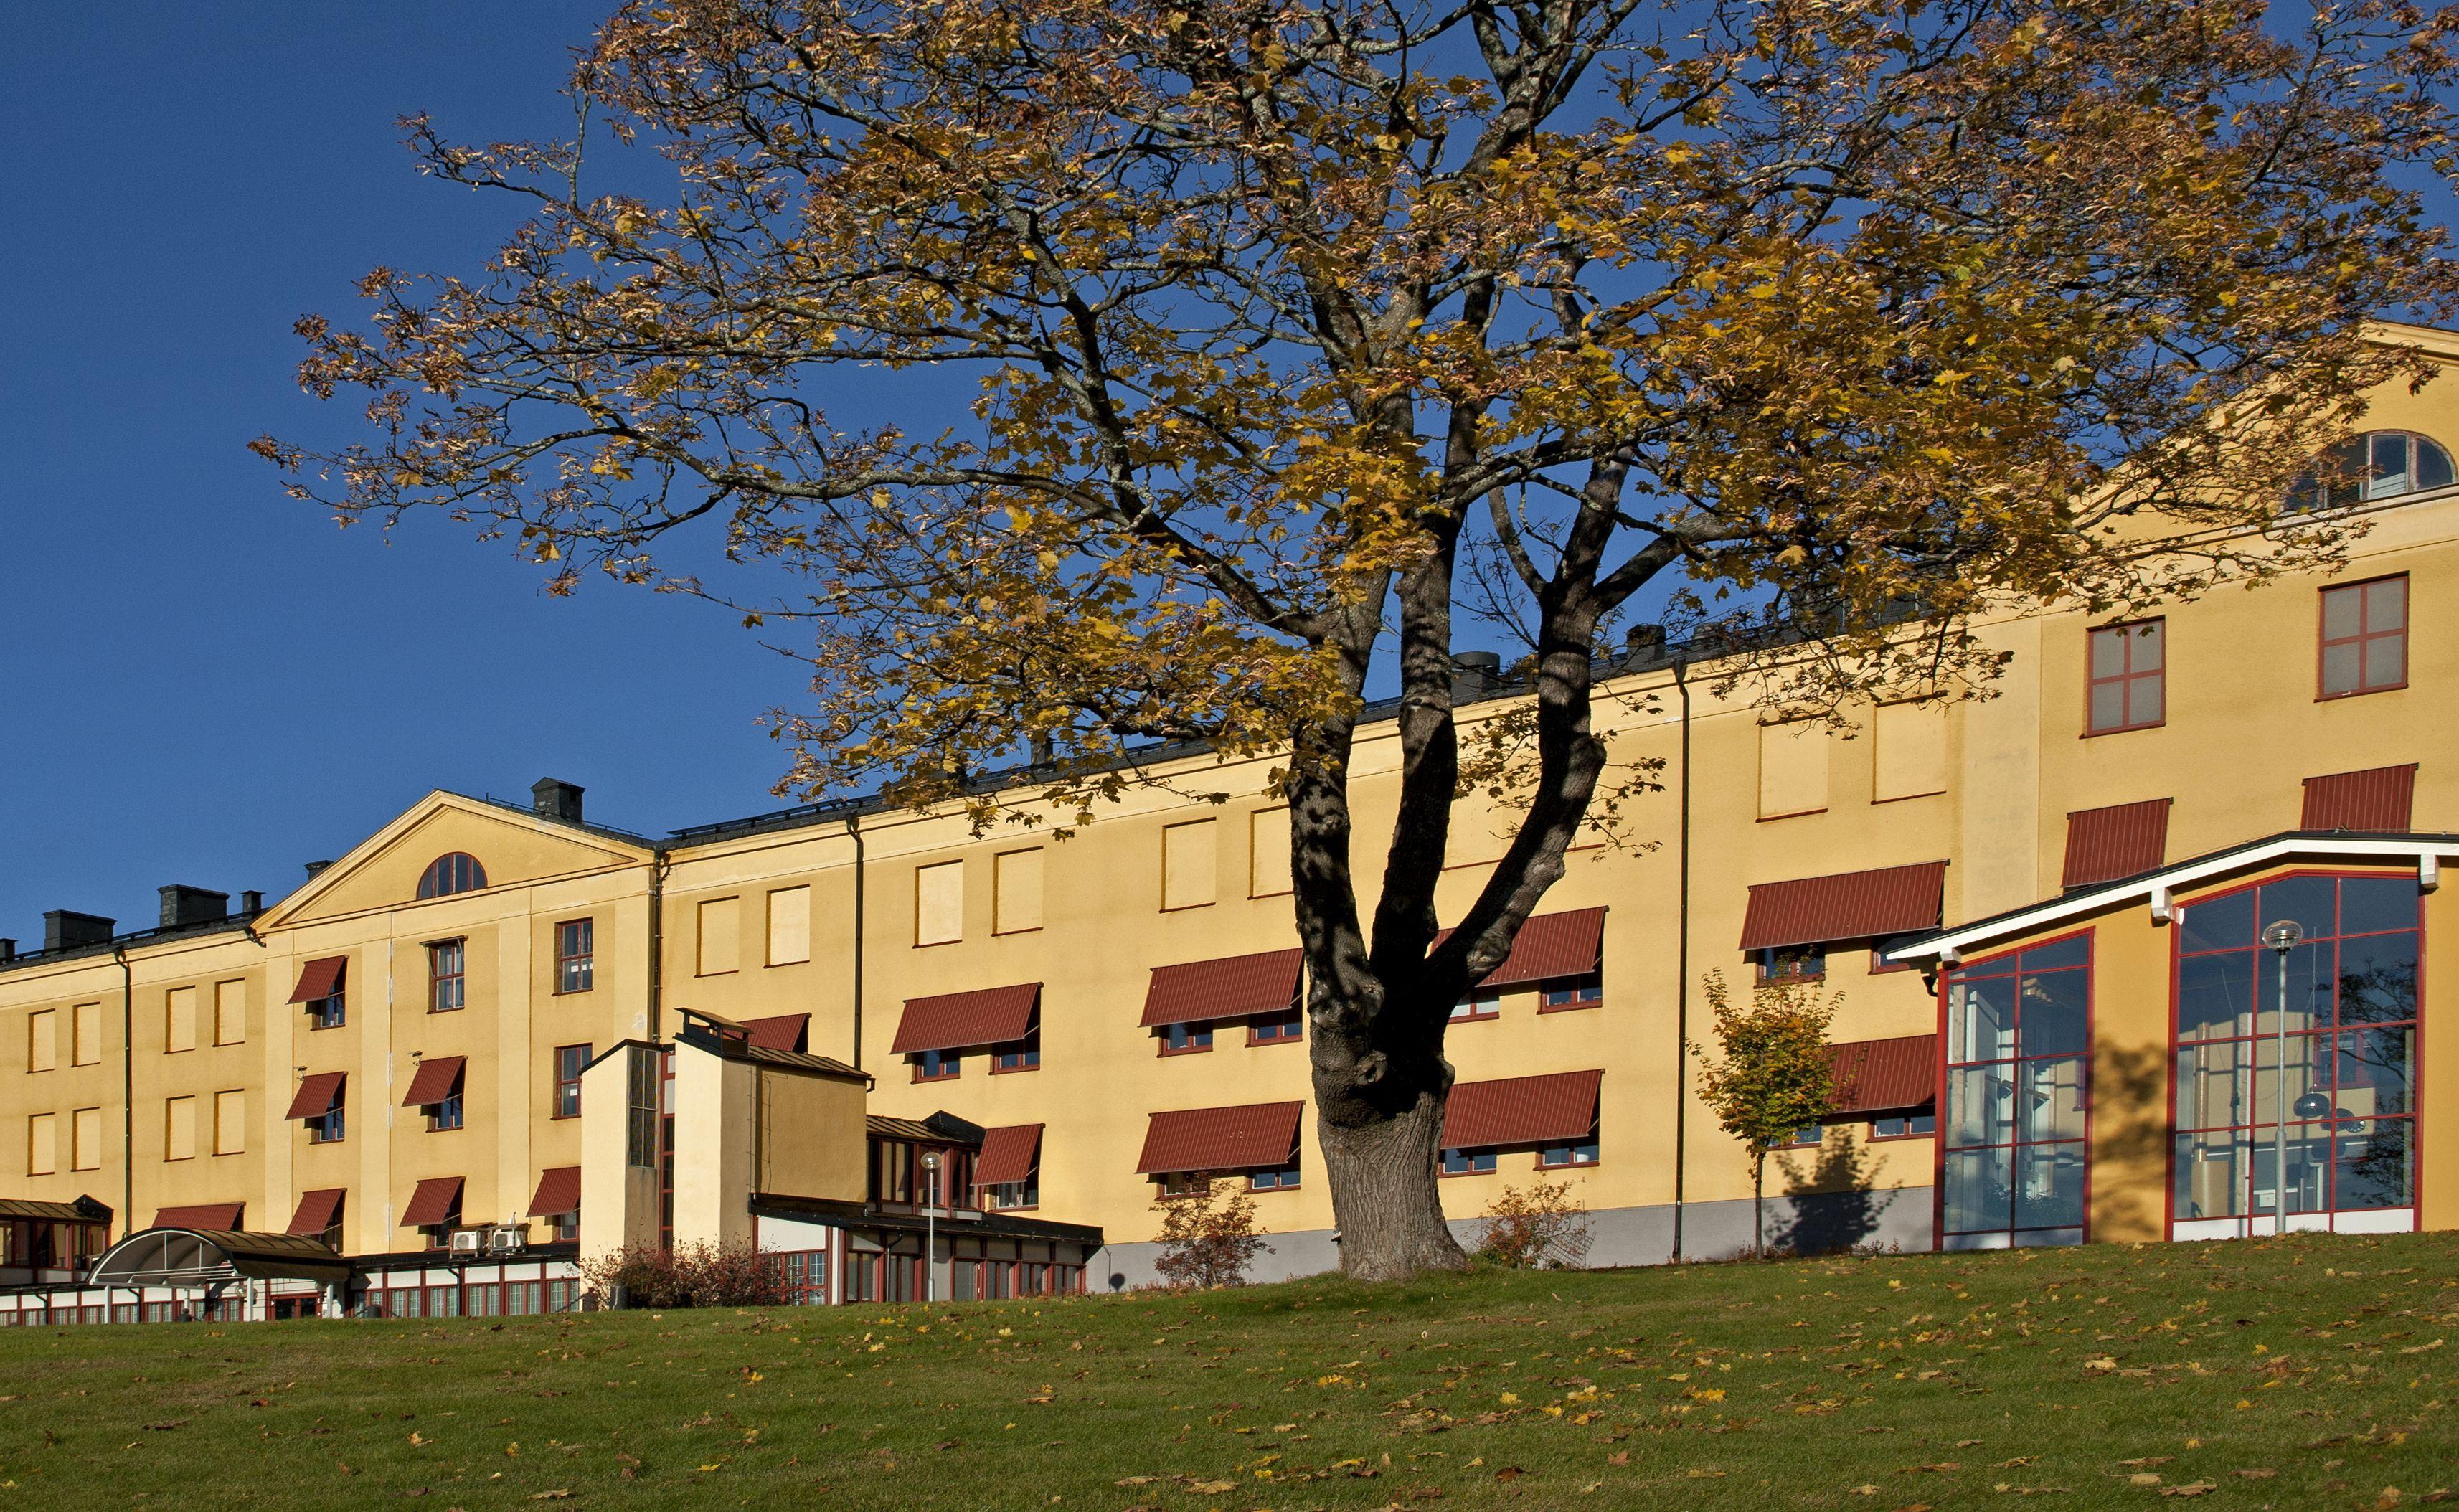 Rolf Boström,  © Landsarkivet i Härnösand/Rolf Boström, Landsarkivet i Härnösand, Rosenbäcksallén